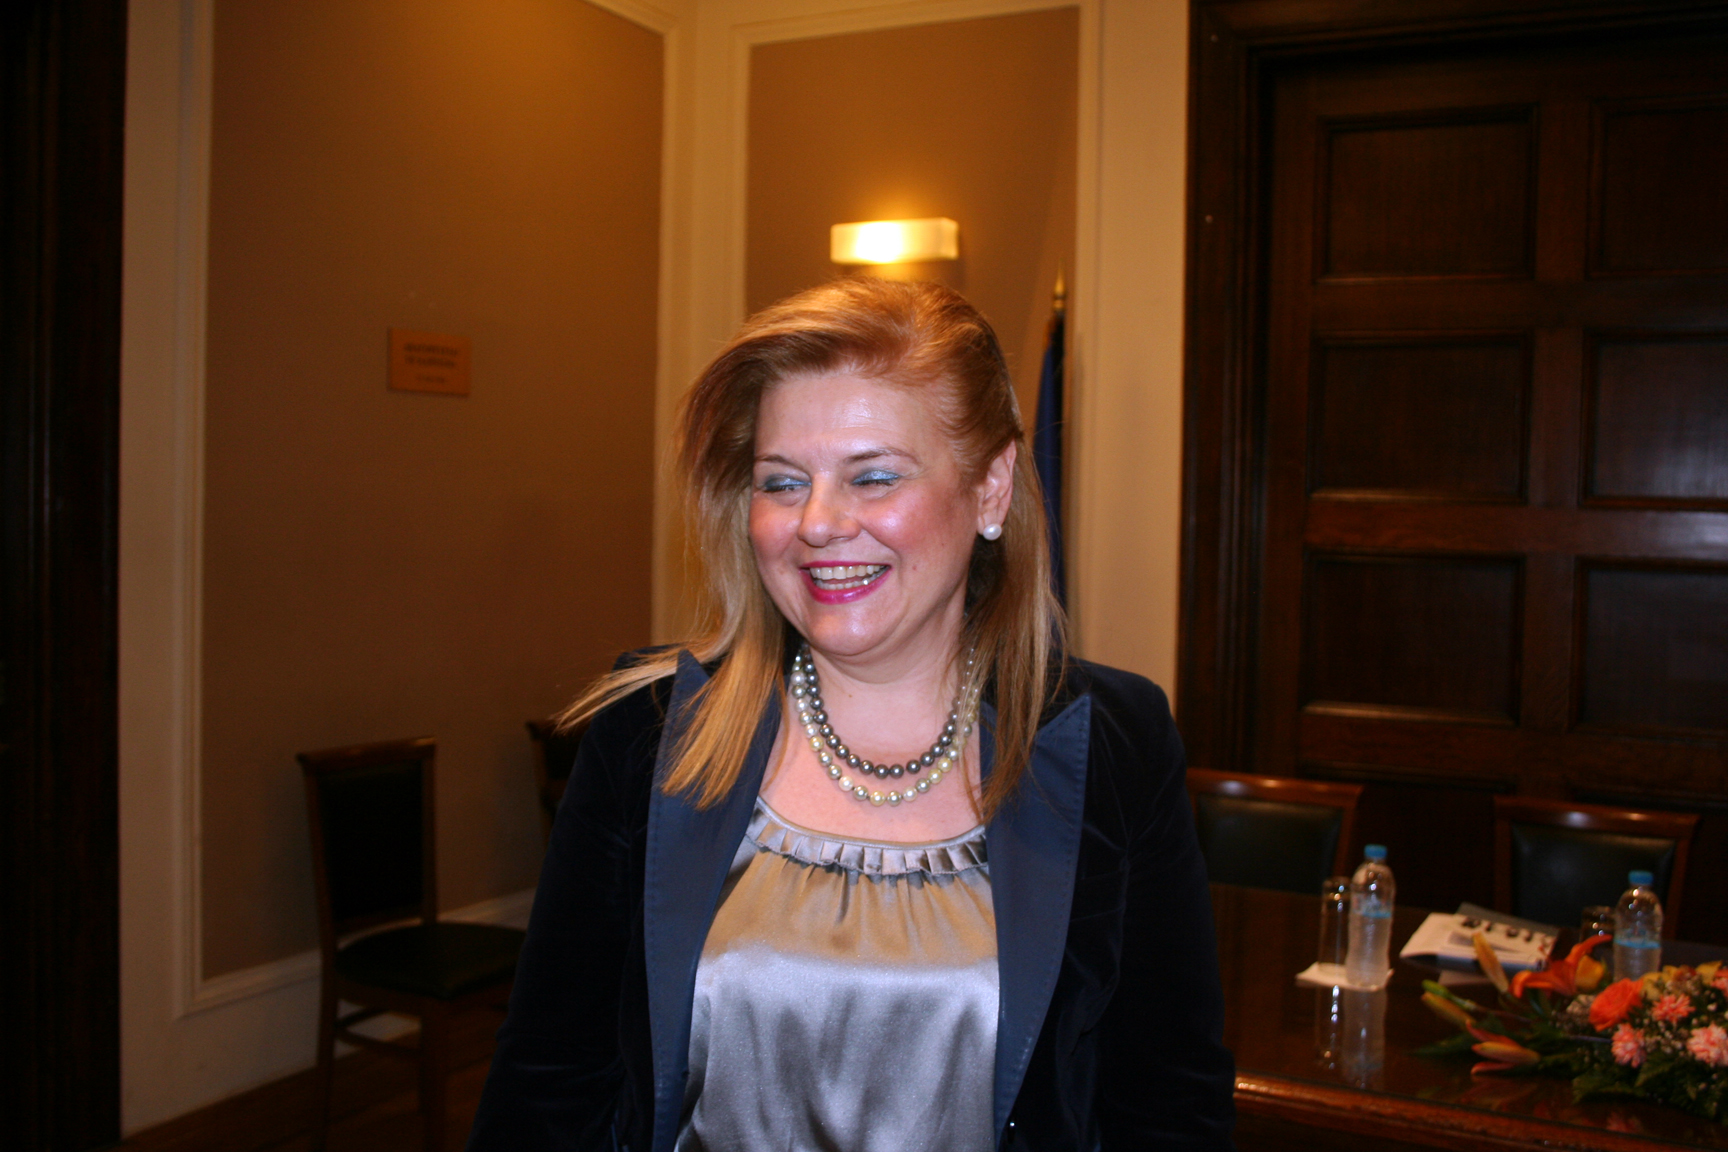 Gallery Παρουσίαση βιβλίου της Βασιλικής Σκορδάκη